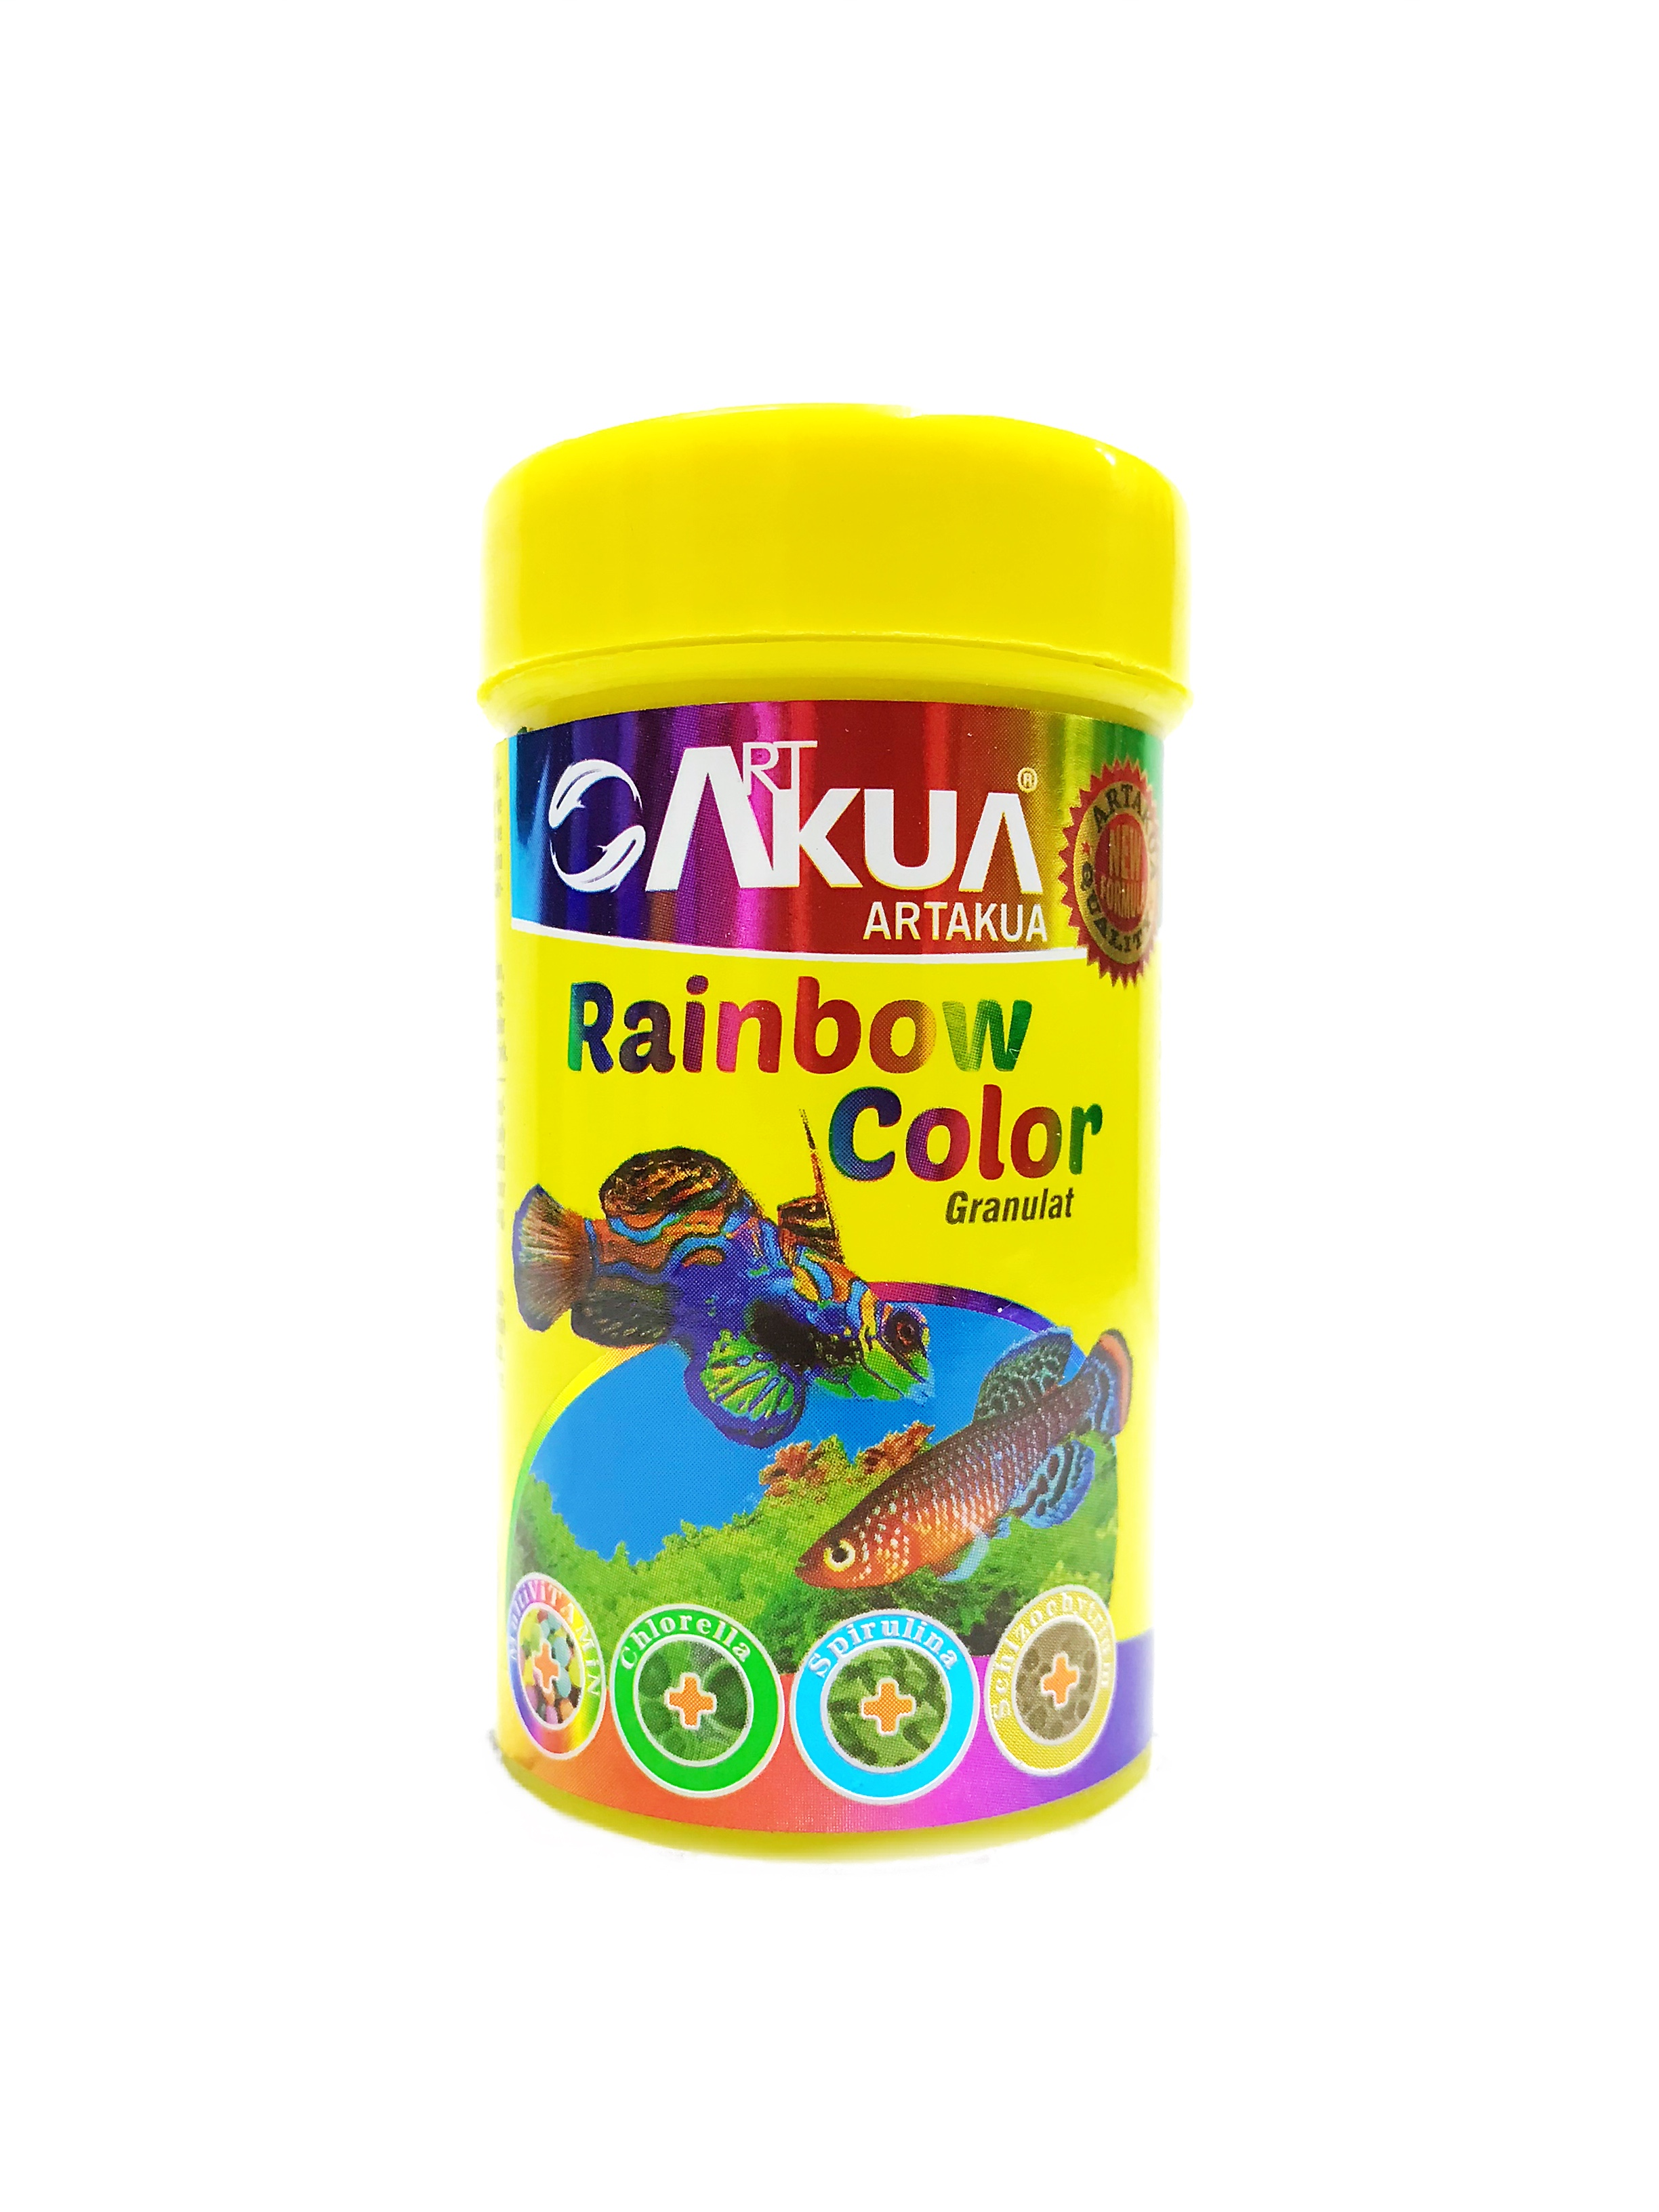 Artakua Rainbow Color